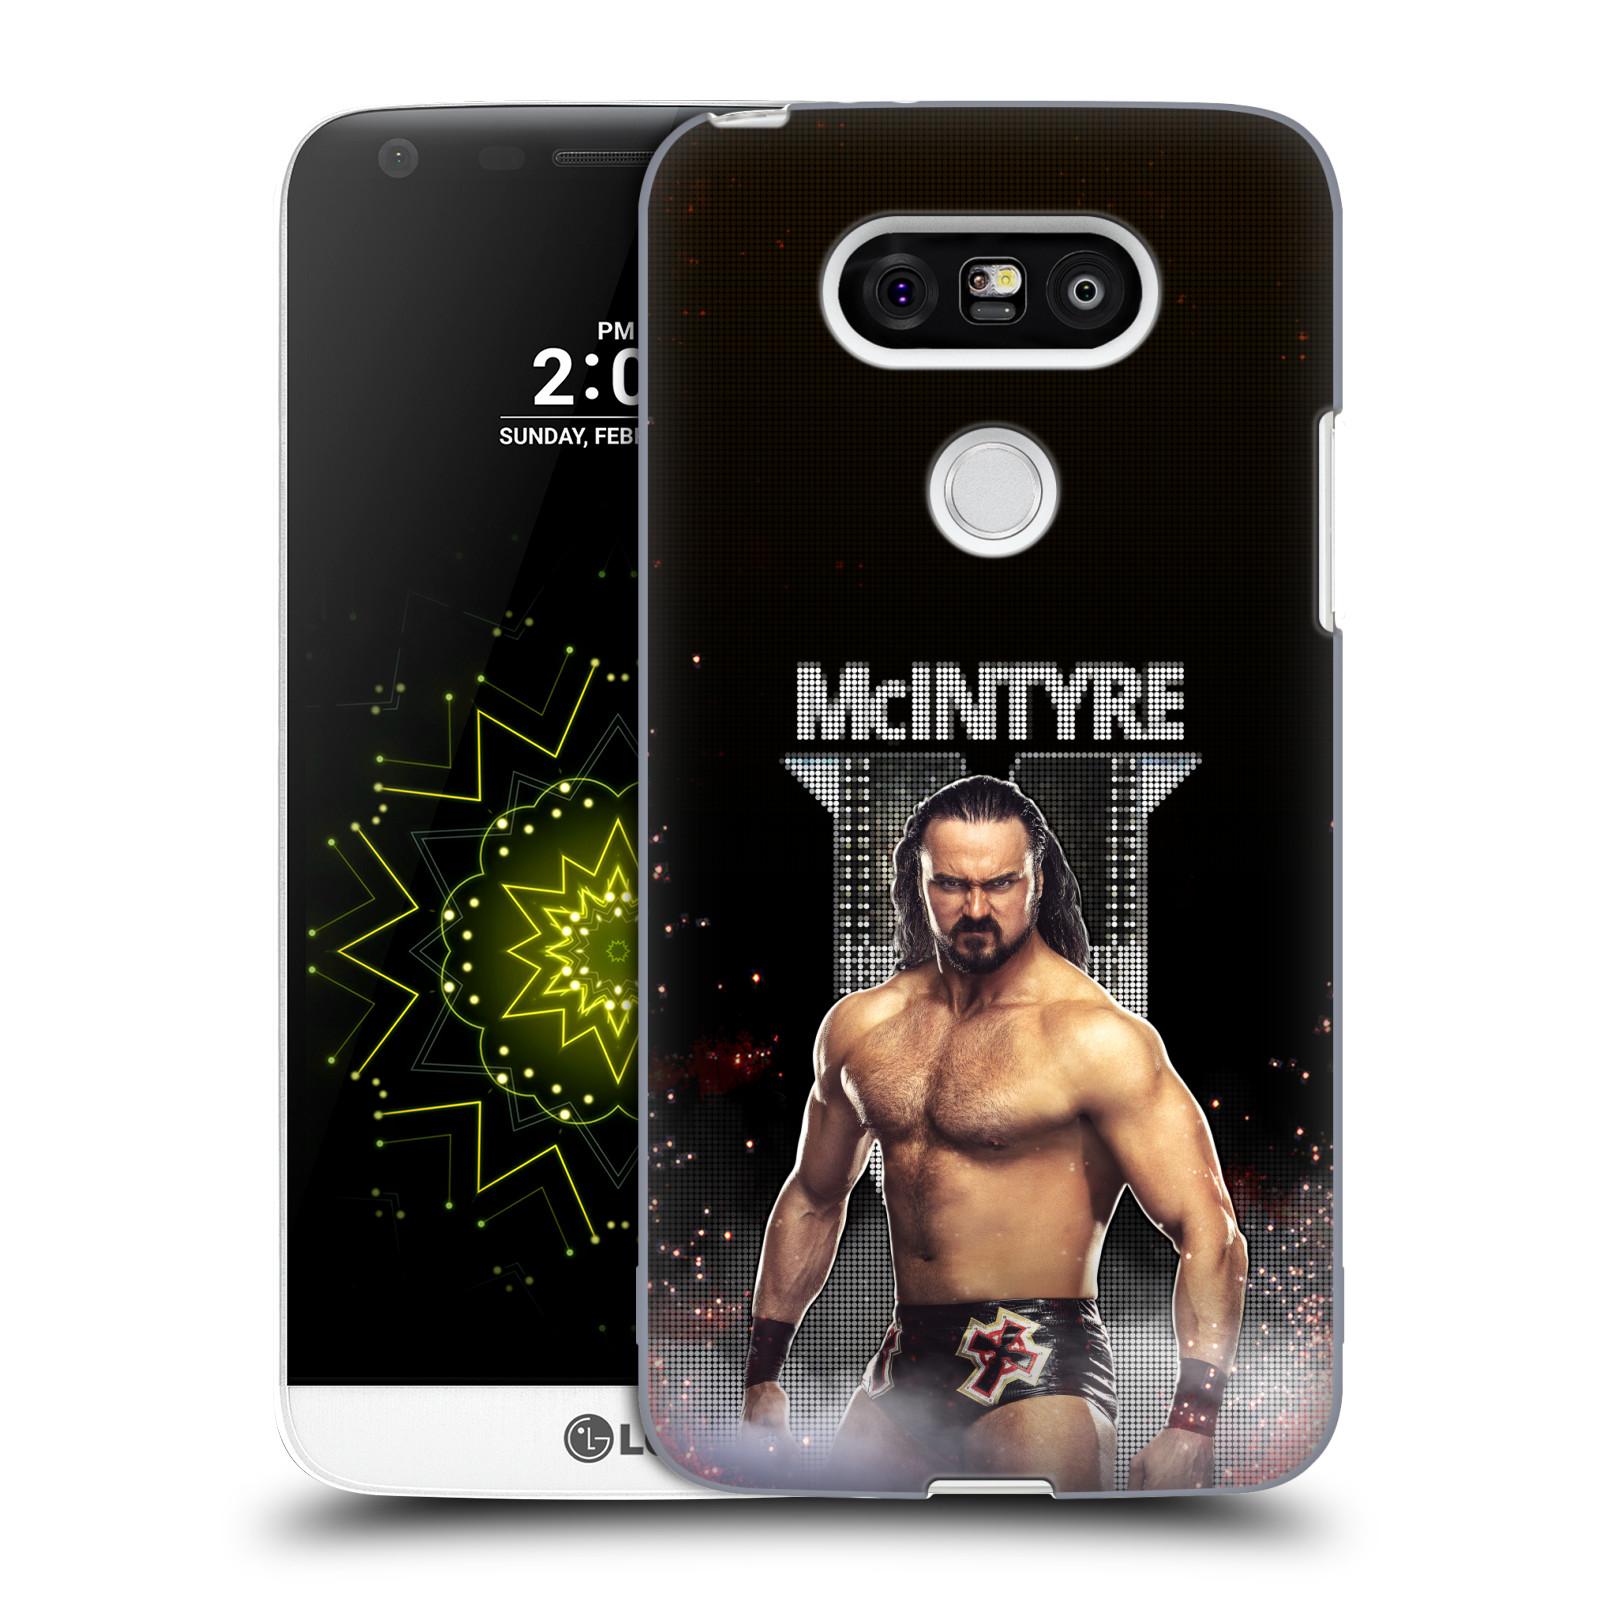 OFFICIAL WWE DREW MCINTYRE HARD BACK CASE FOR LG PHONES 1